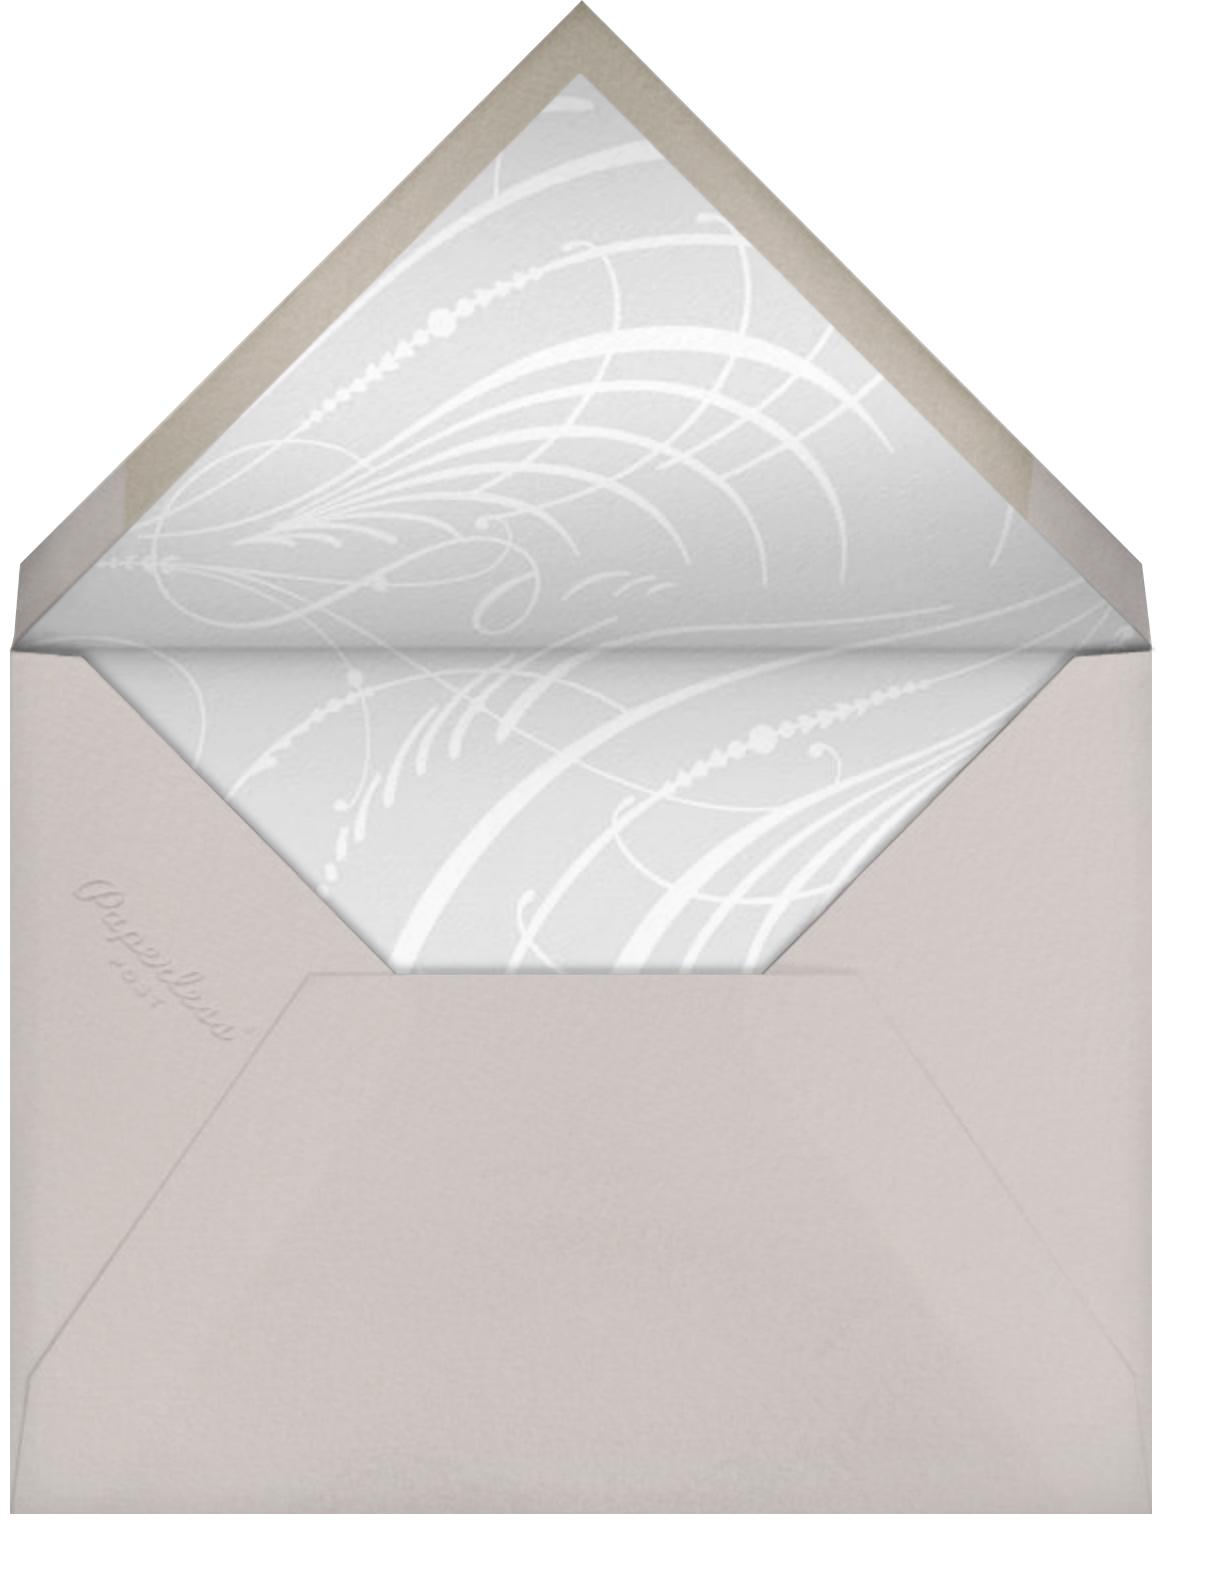 Jarra Bautismal - Paperless Post - Baptism  - envelope back